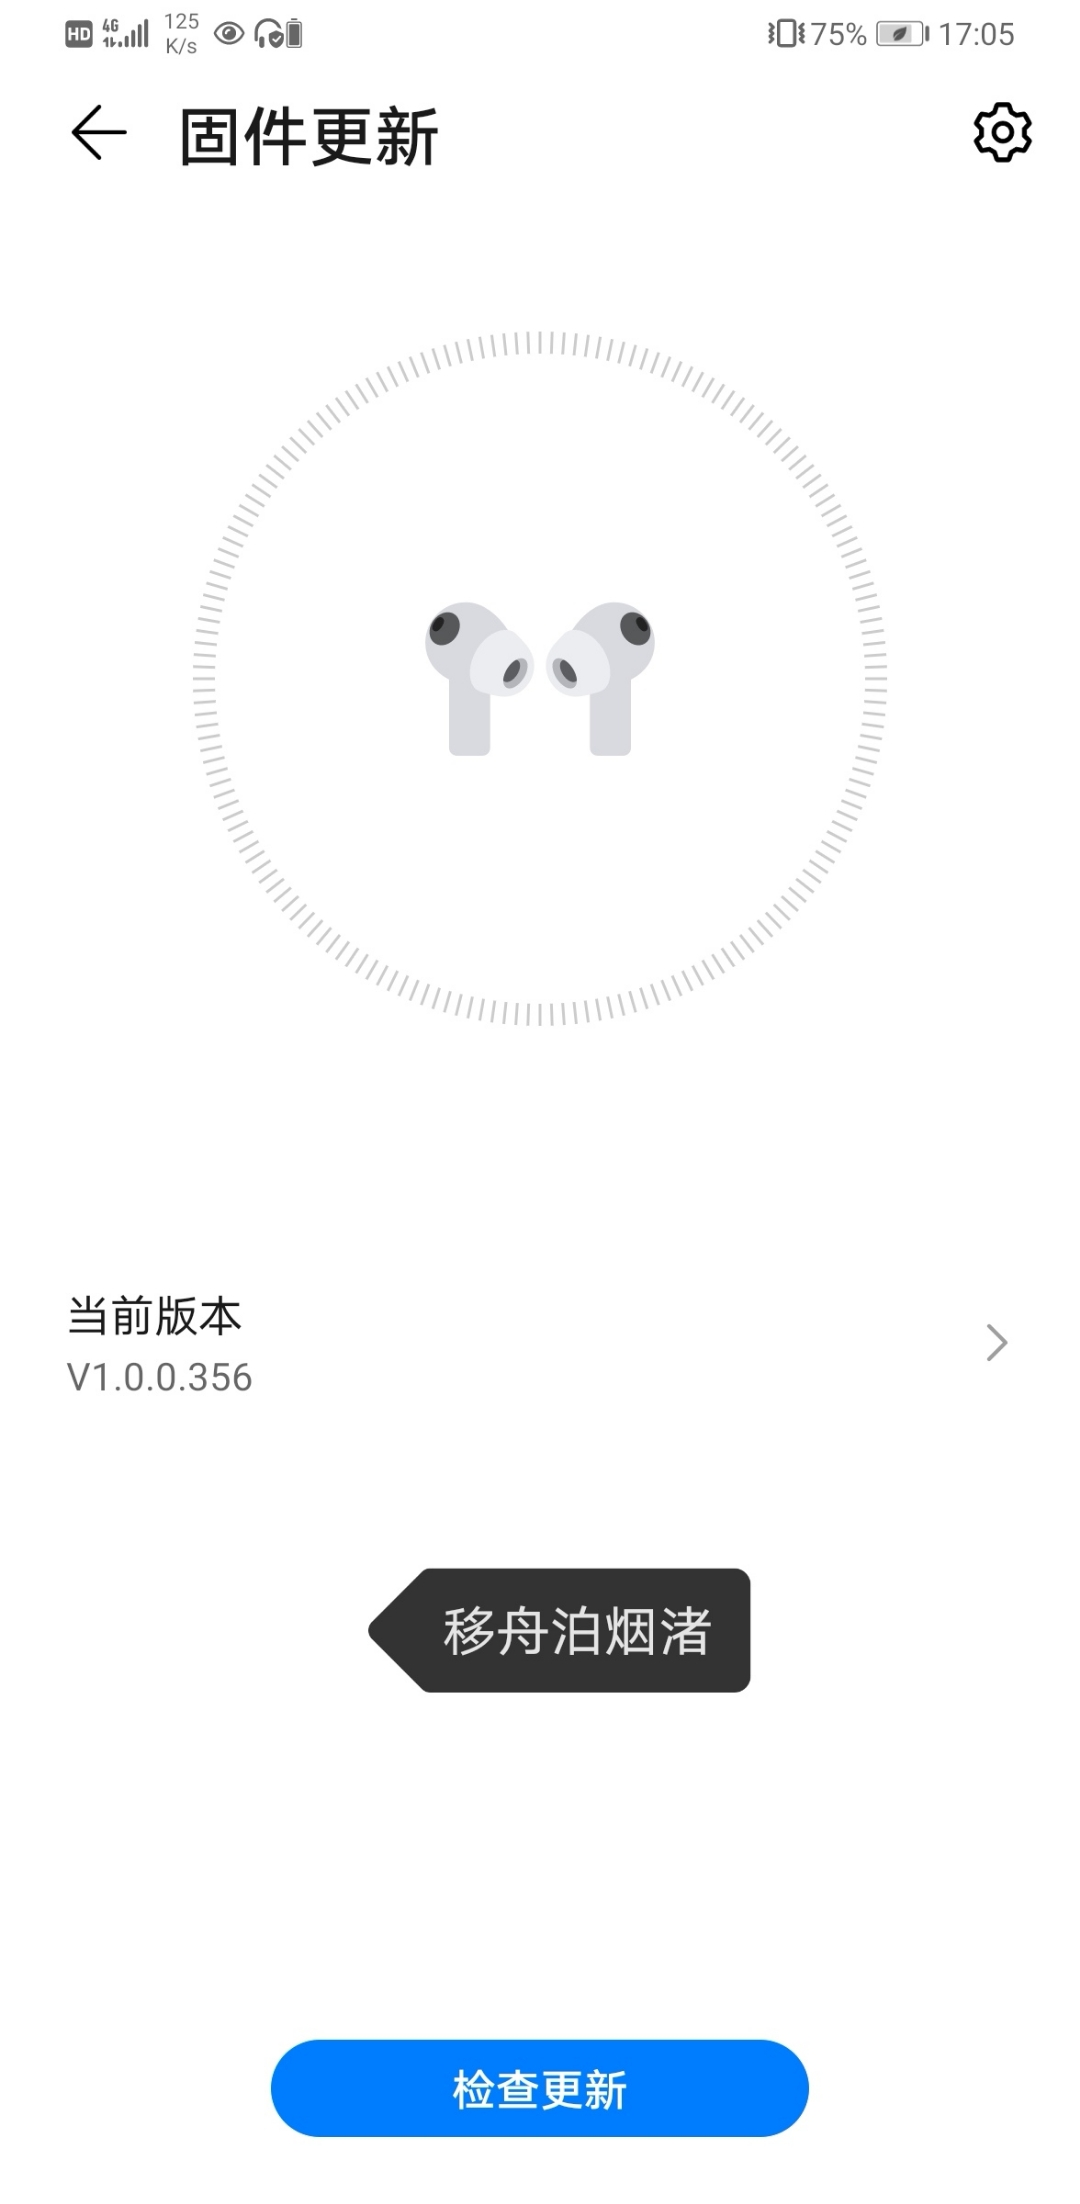 Screenshot_20210329_170550_com.huawei.smarthome_edit_156186568117834.jpg